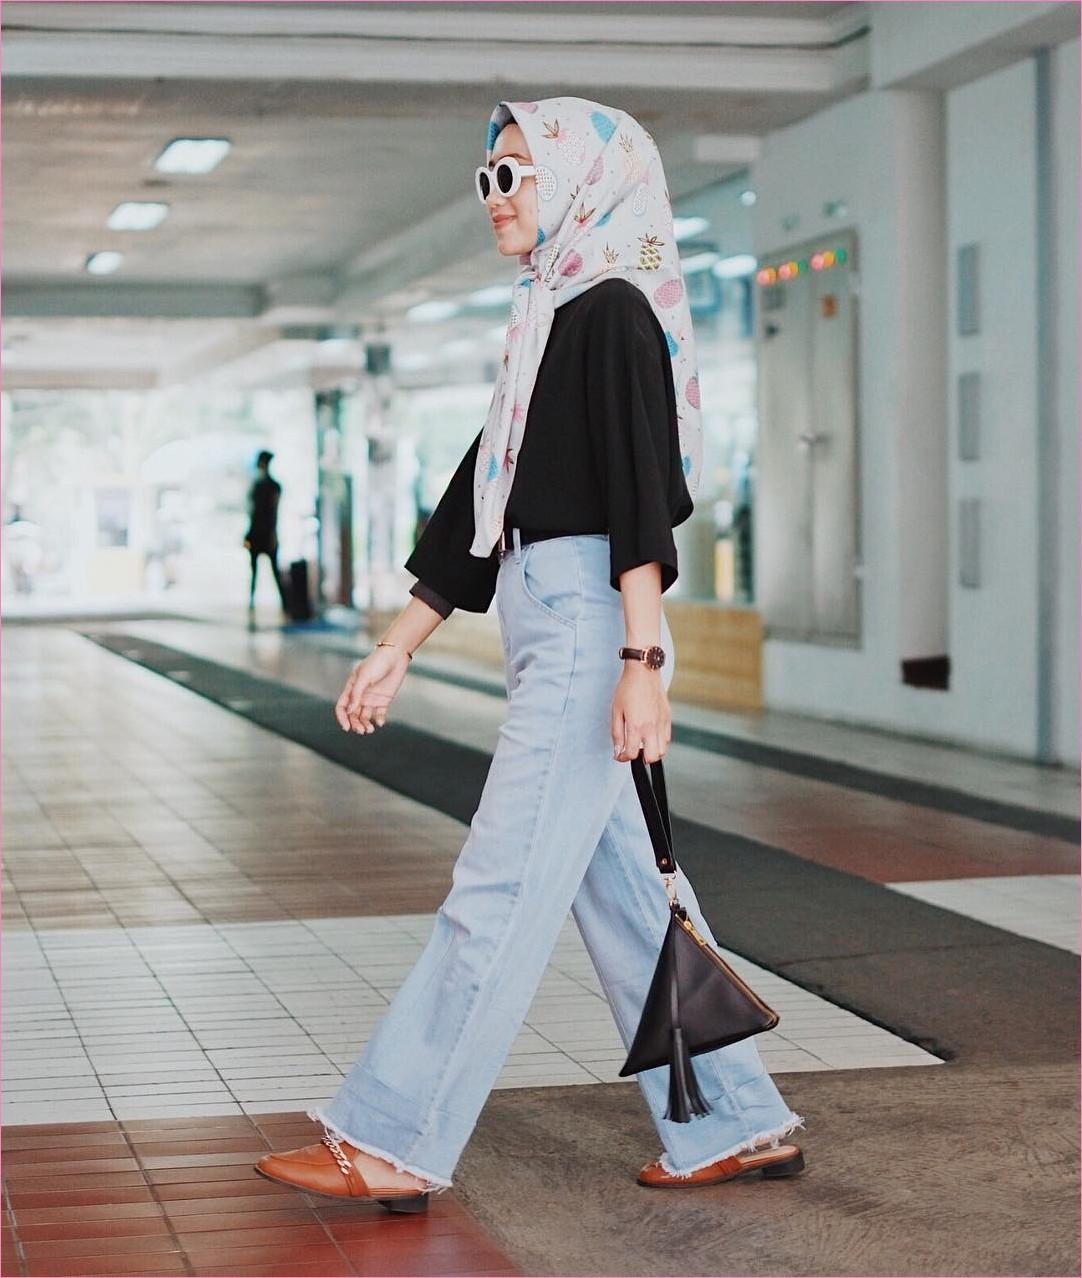 Outfit Kerudung Segiempat Ala Selebgram 2018 kerudung segiempat hijab square scarf bermotif daun baju top blouse hitam celana jeans denim sobek slingbags loafers and slip ons coklat kacamata jam tangan emas ootd trendy